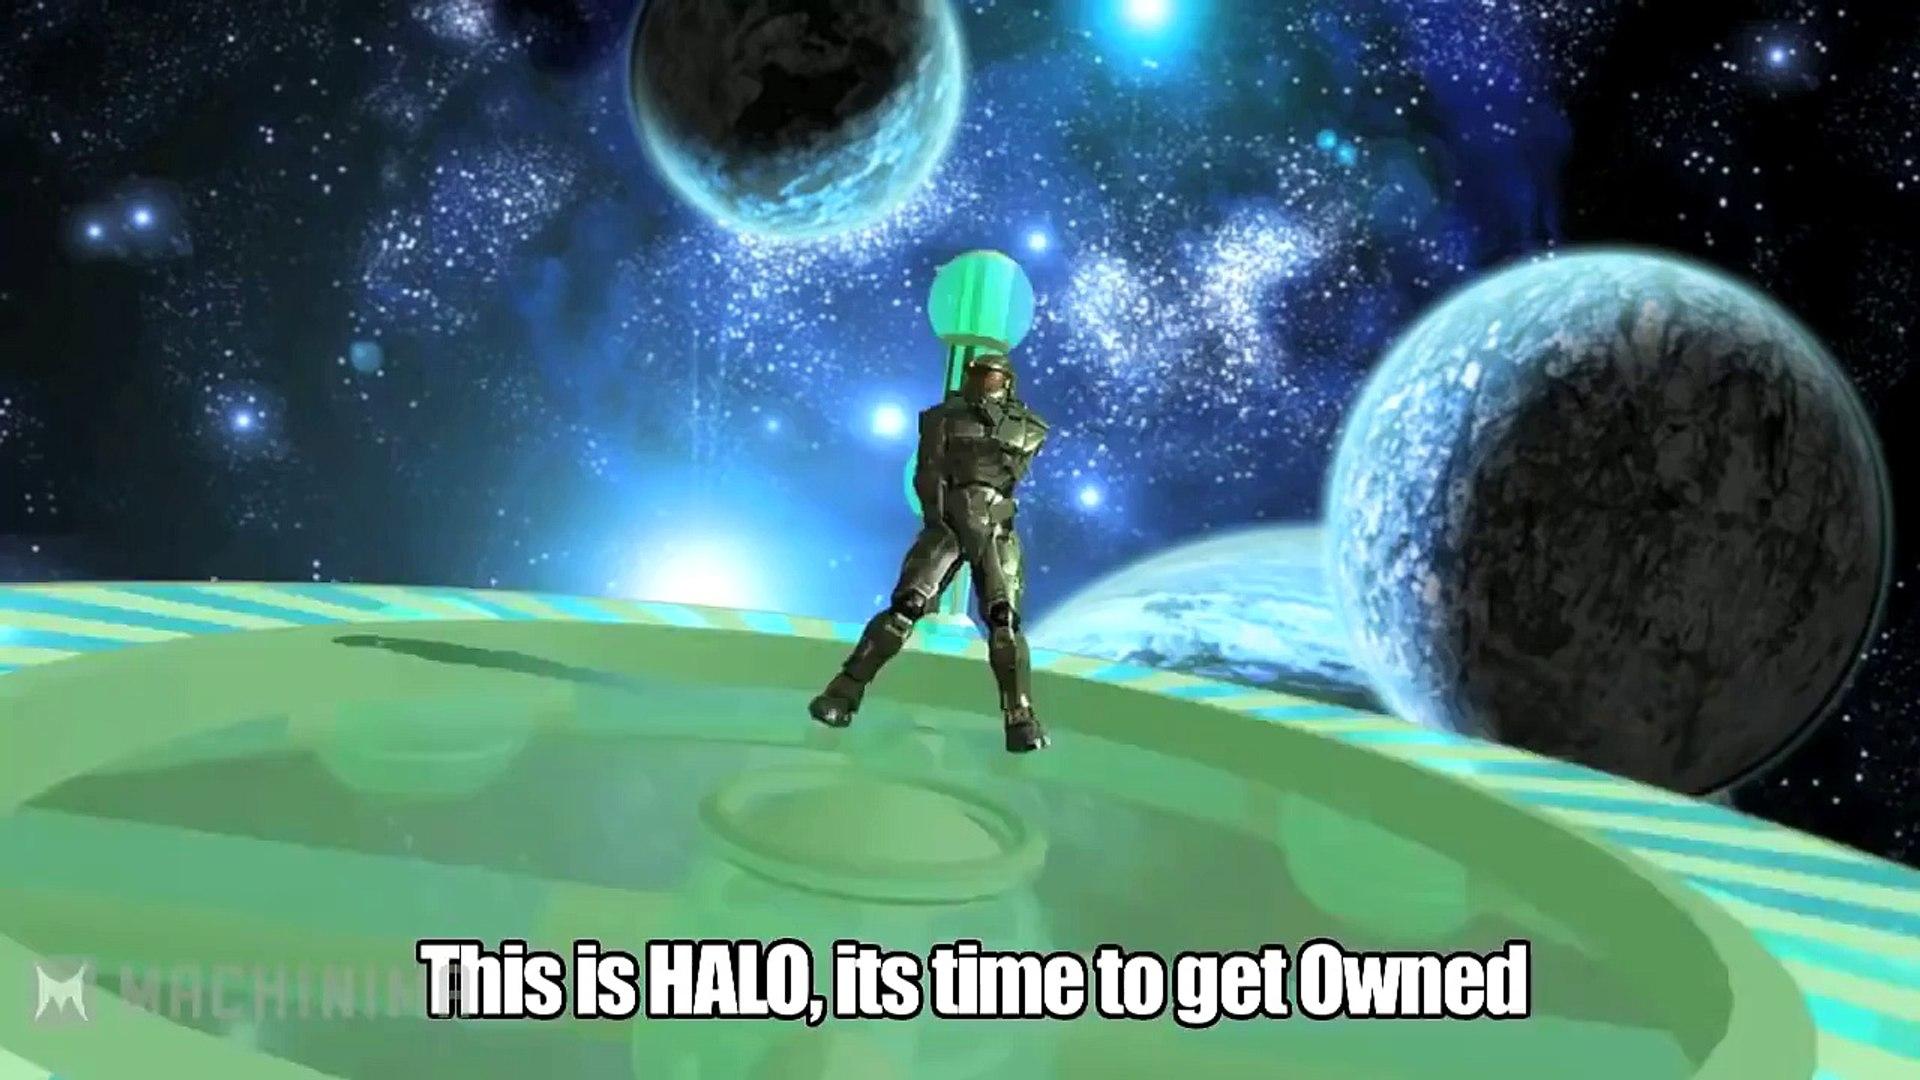 TeamHeadKick Music Videos - Halo 4 Spartan Style Gangnam Style Parody (Music Video)